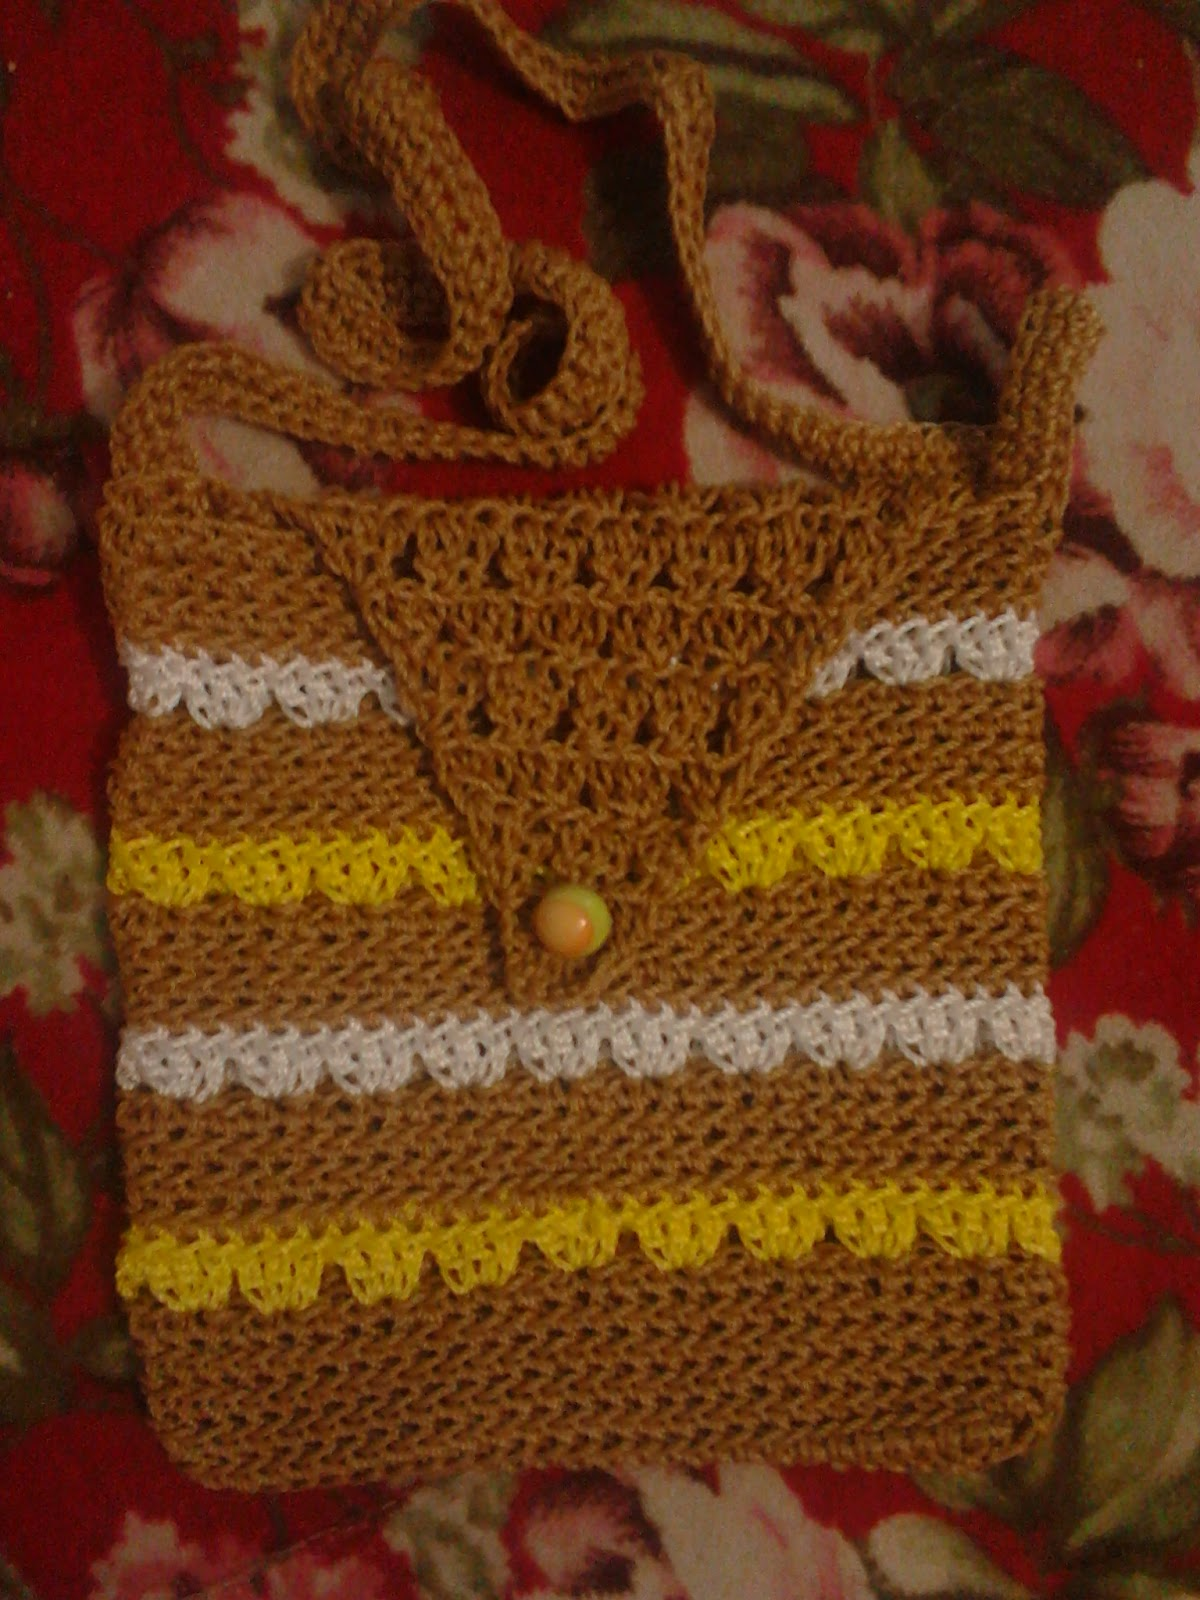 Bolsos A Crochet M a Tejidos Kreaciones qw1gOfx4np